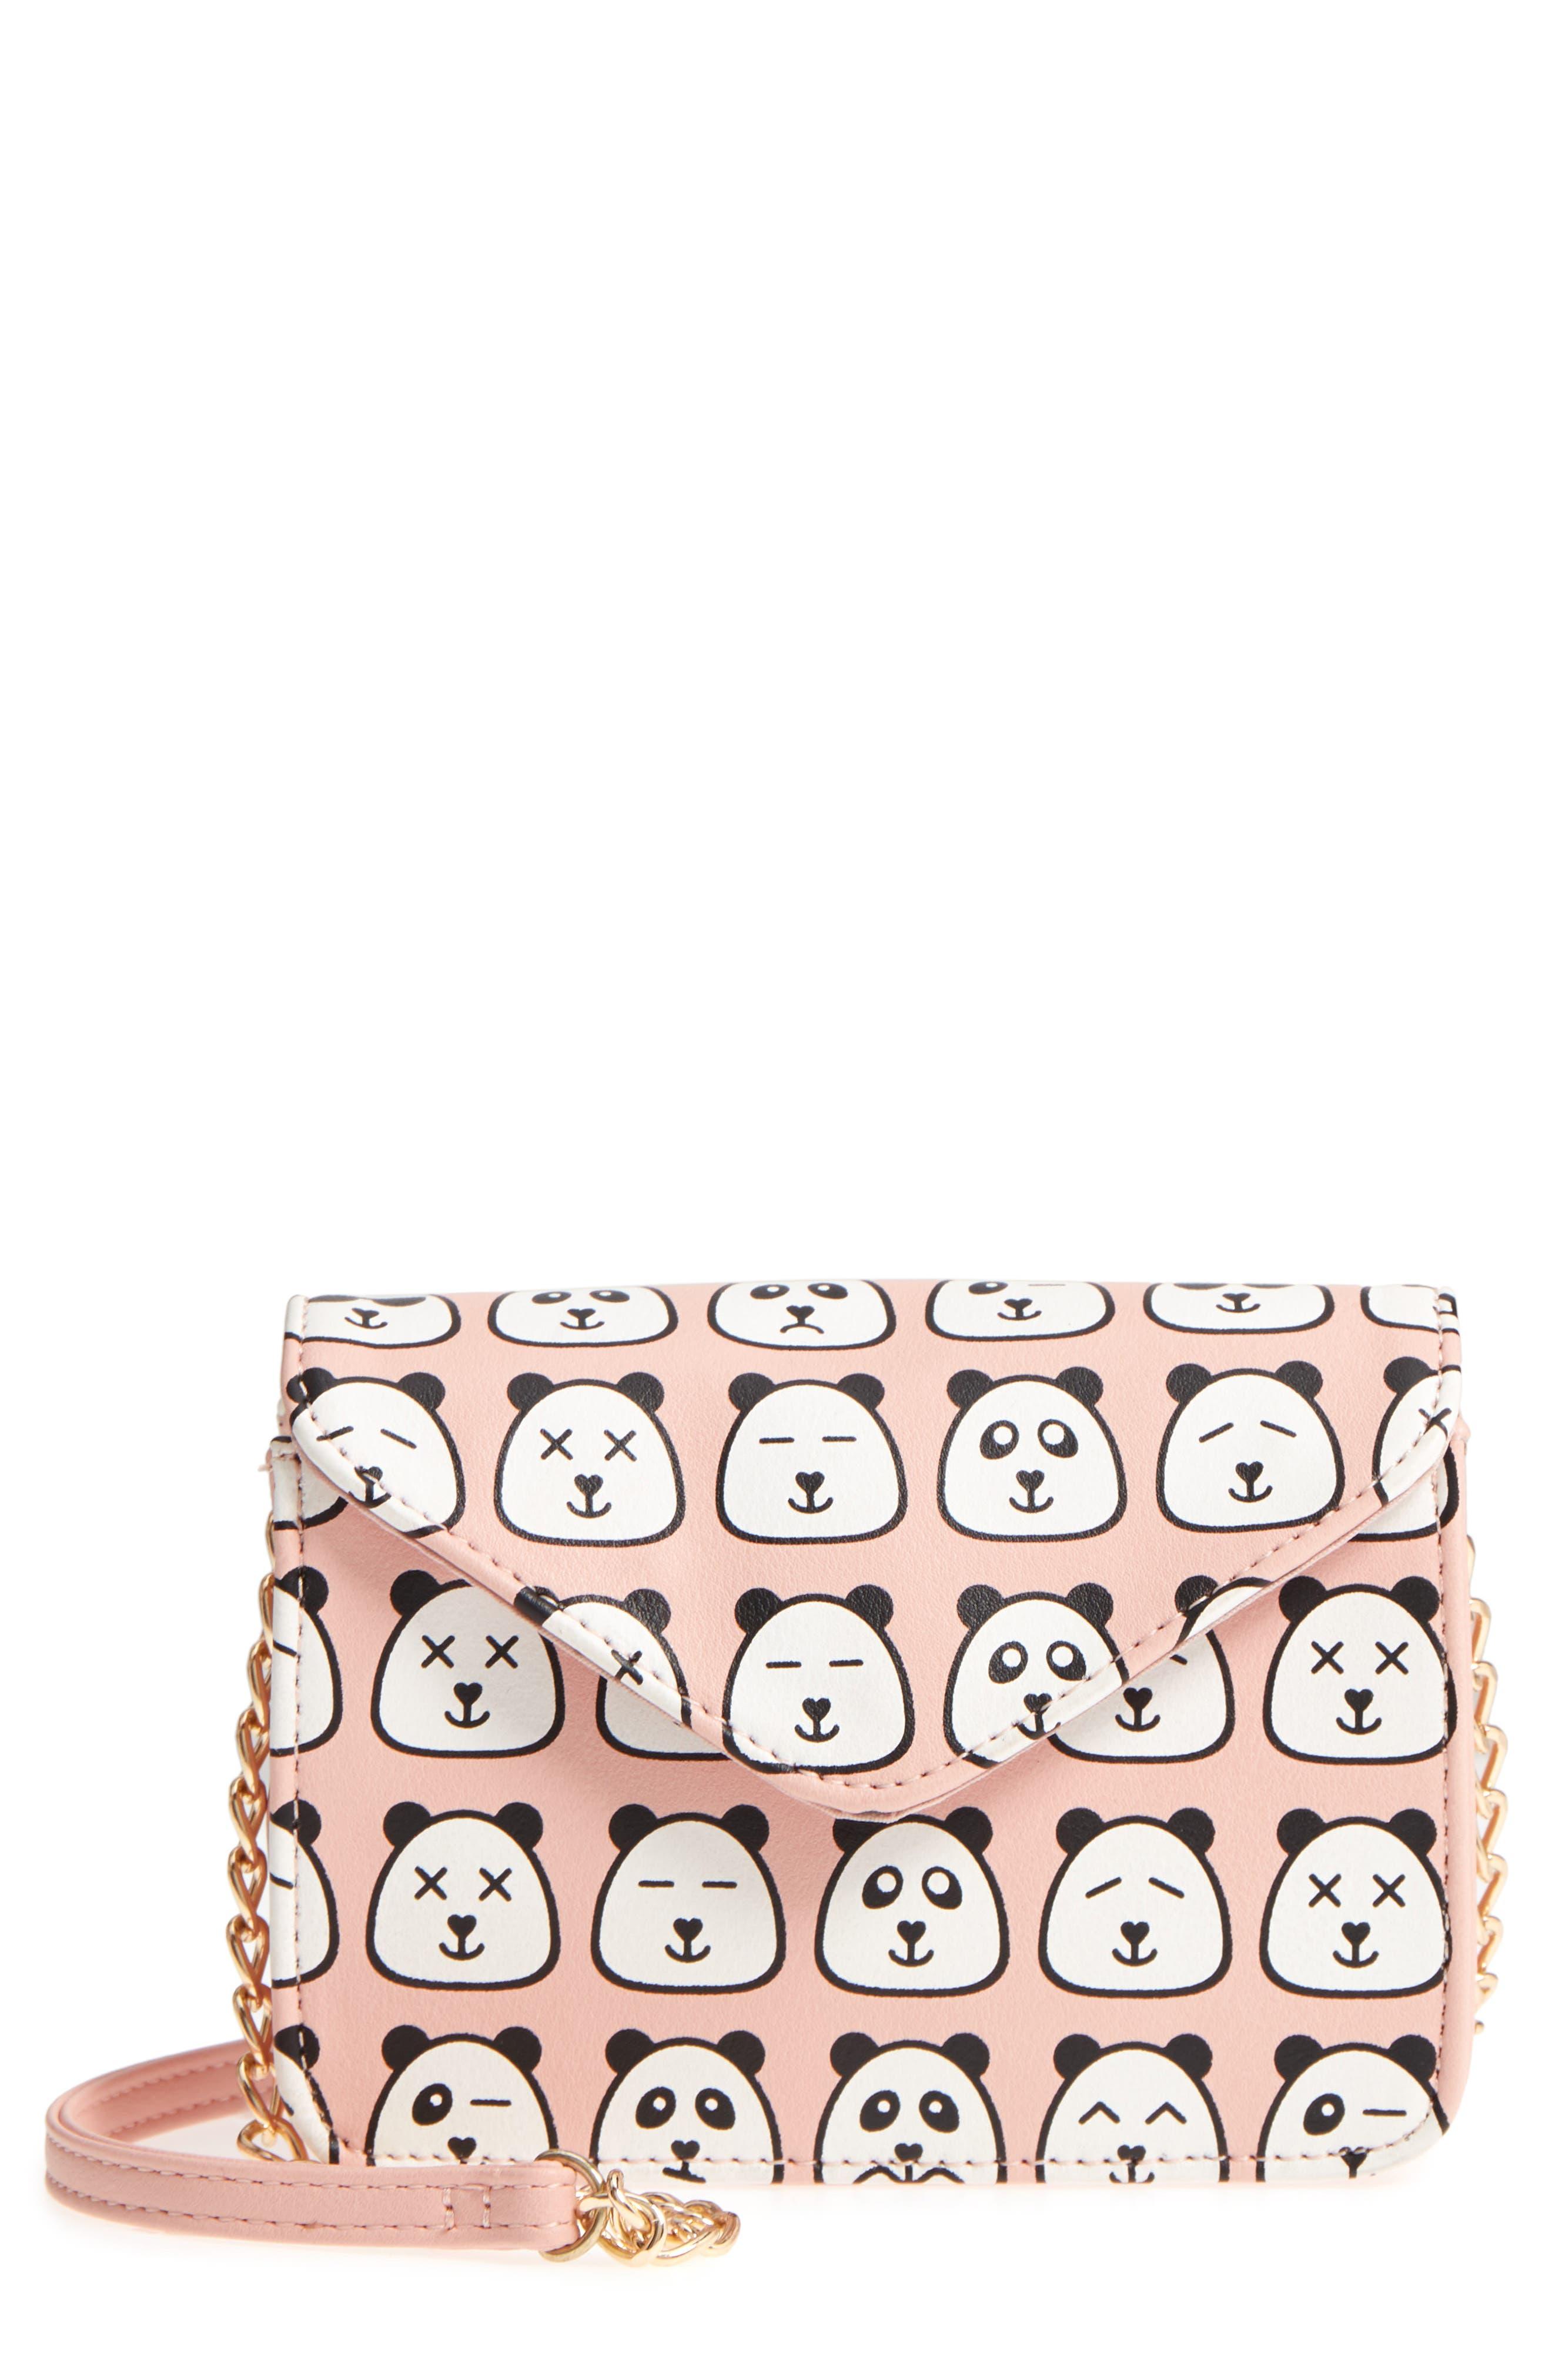 Panda Print Crossbody Bag,                         Main,                         color,